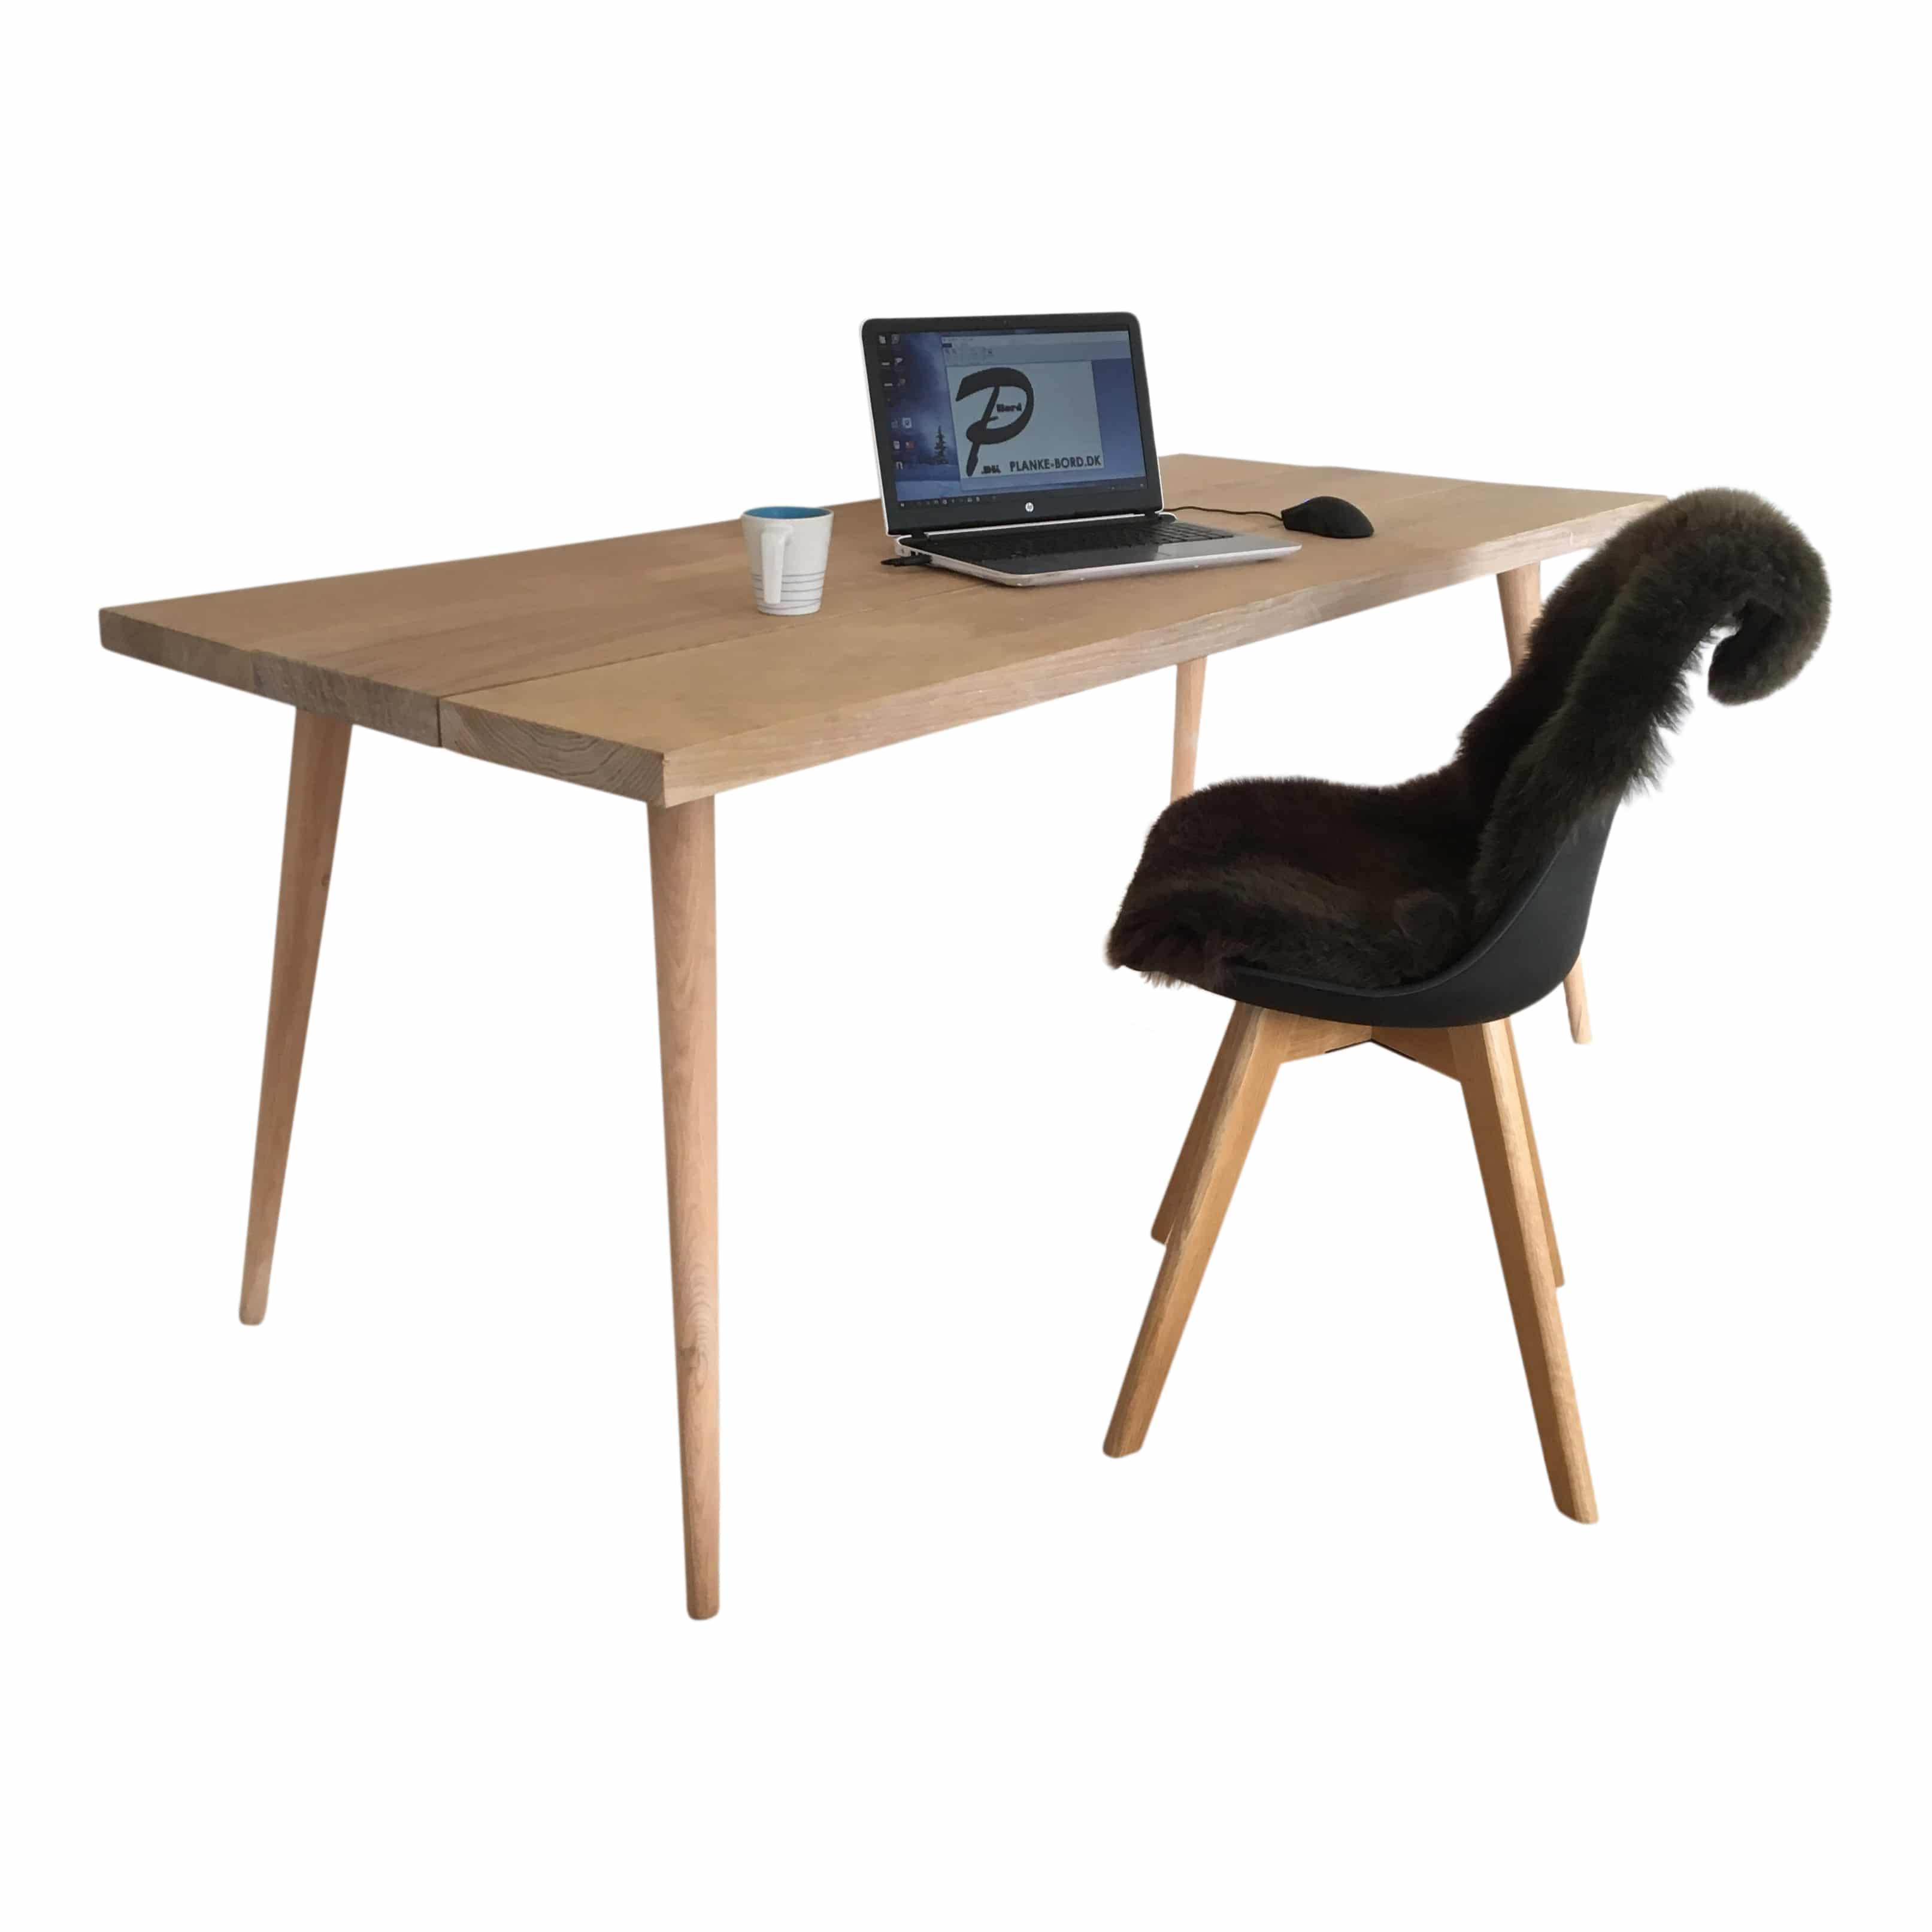 Dejlig Skrivebord - Plankebord - Eg - Bestil online - Planke-bord.dk JU-79